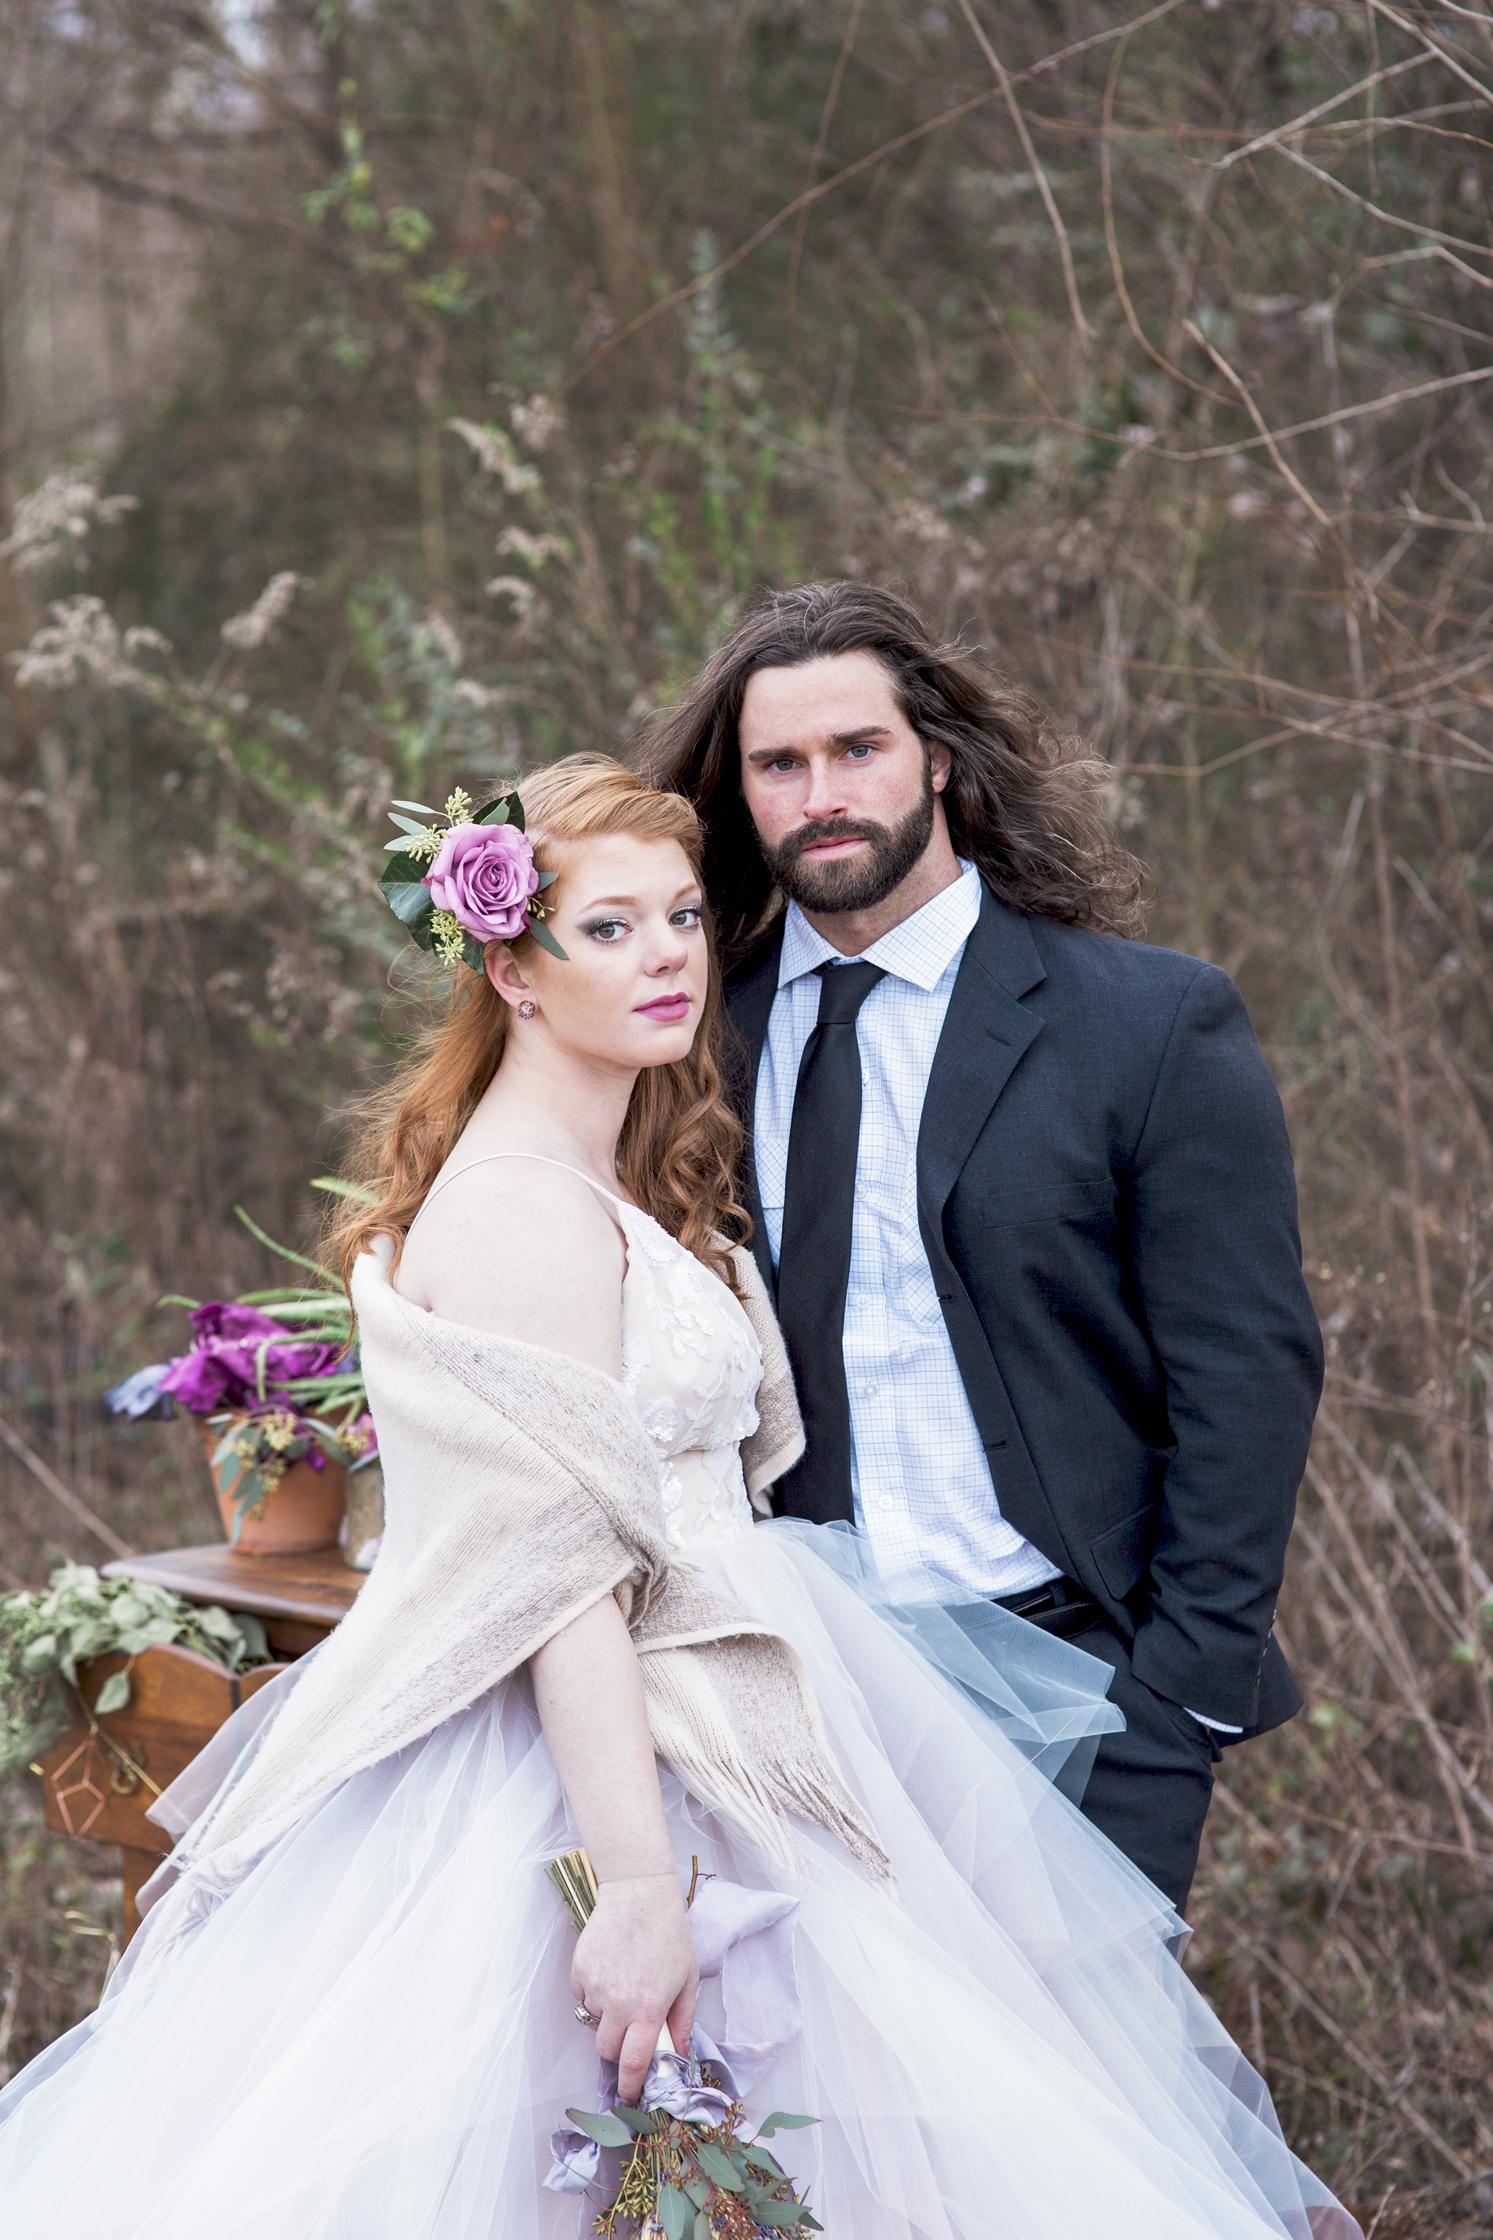 Sara + Matt + Ella _Give Back Bride_Styled Wedding Shoot _K. Stoddard Photography022.jpg